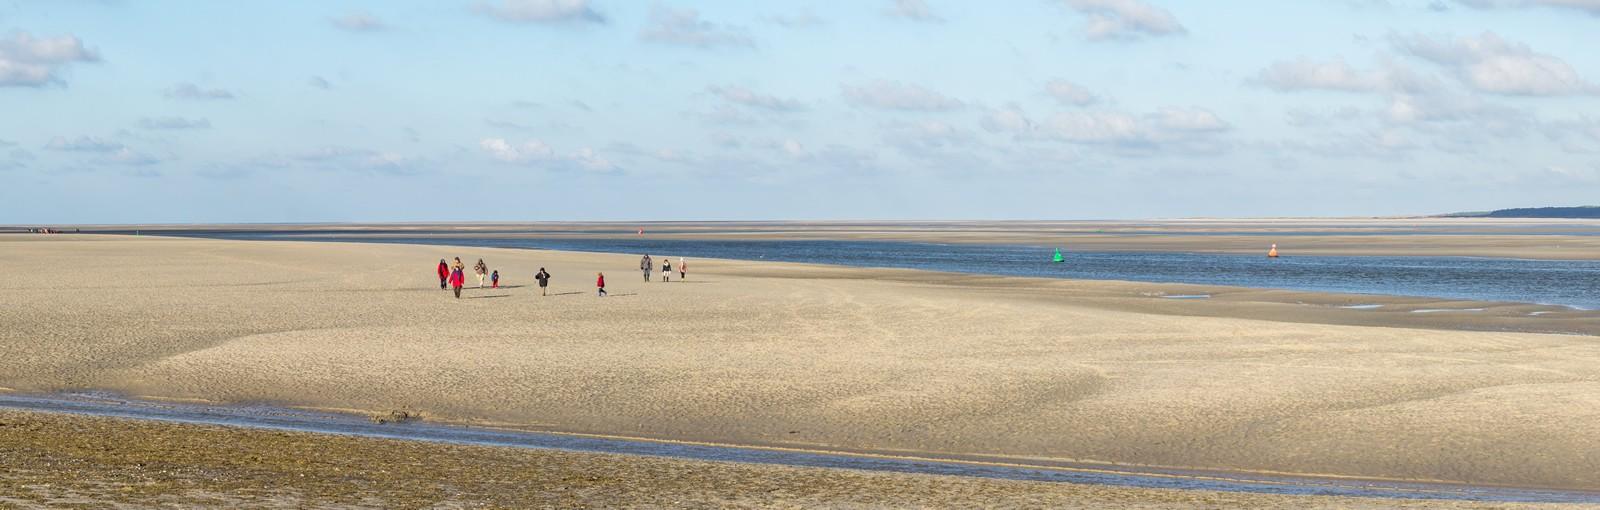 Bahía de Somme - Le Hourdel